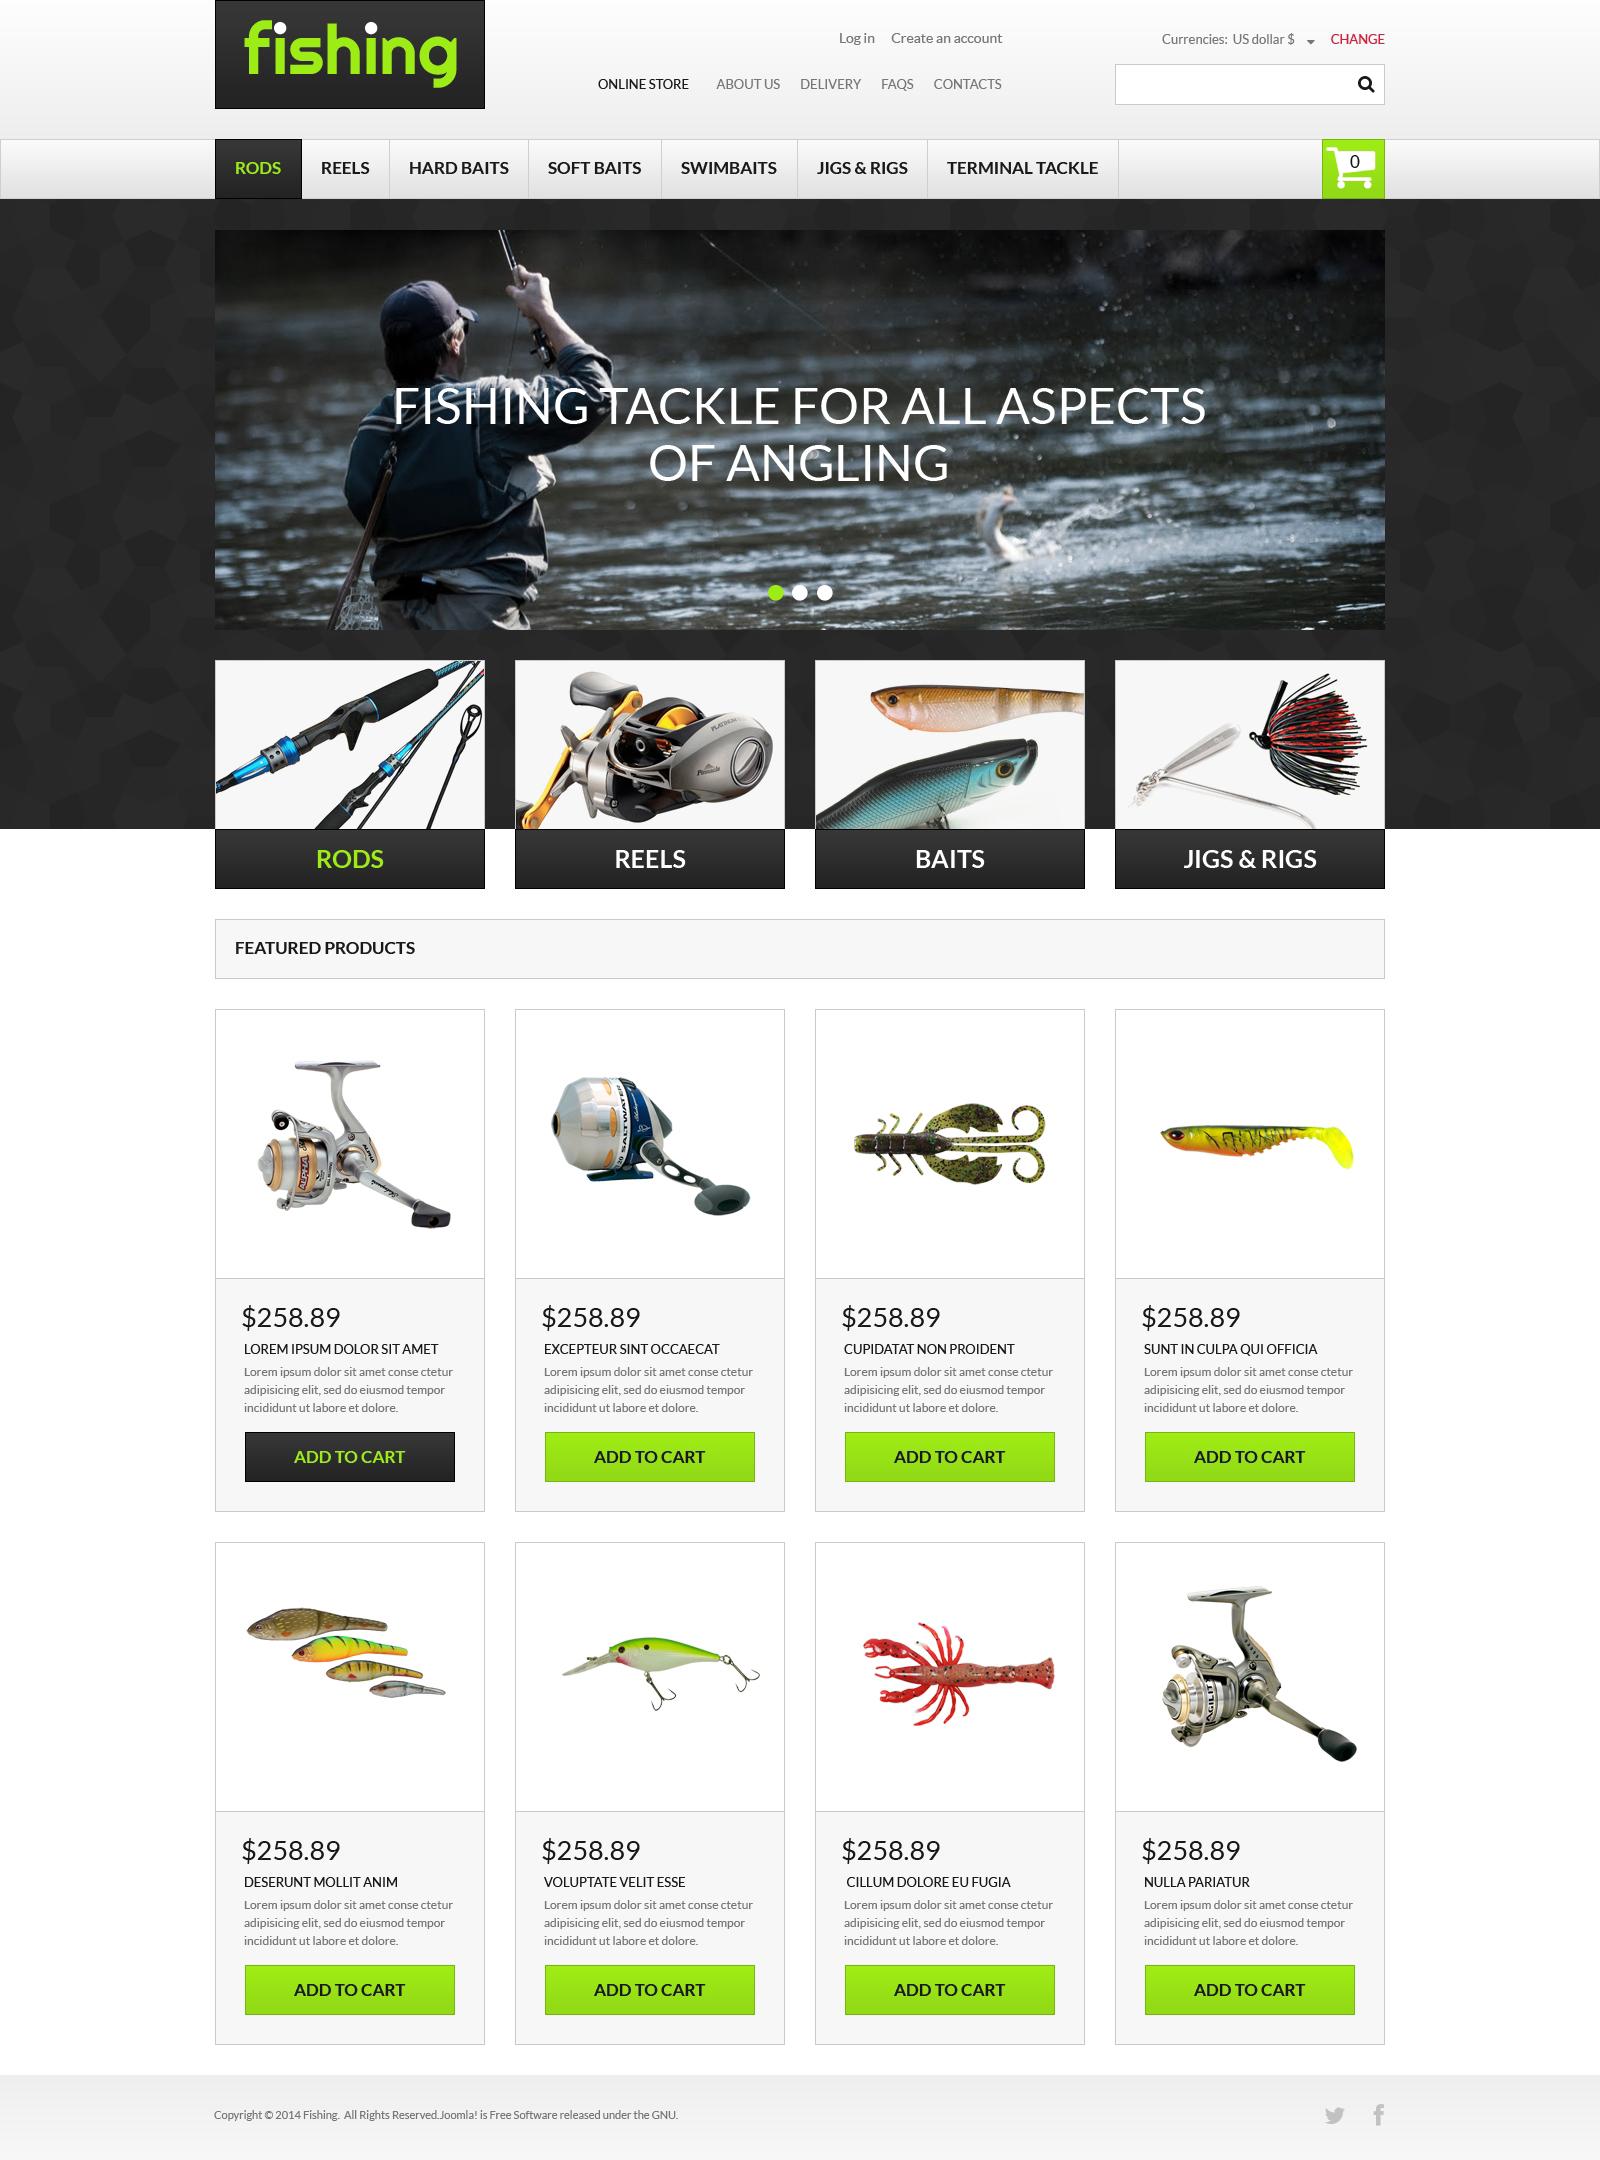 Varity of Fishing Equipment №49441 - скриншот